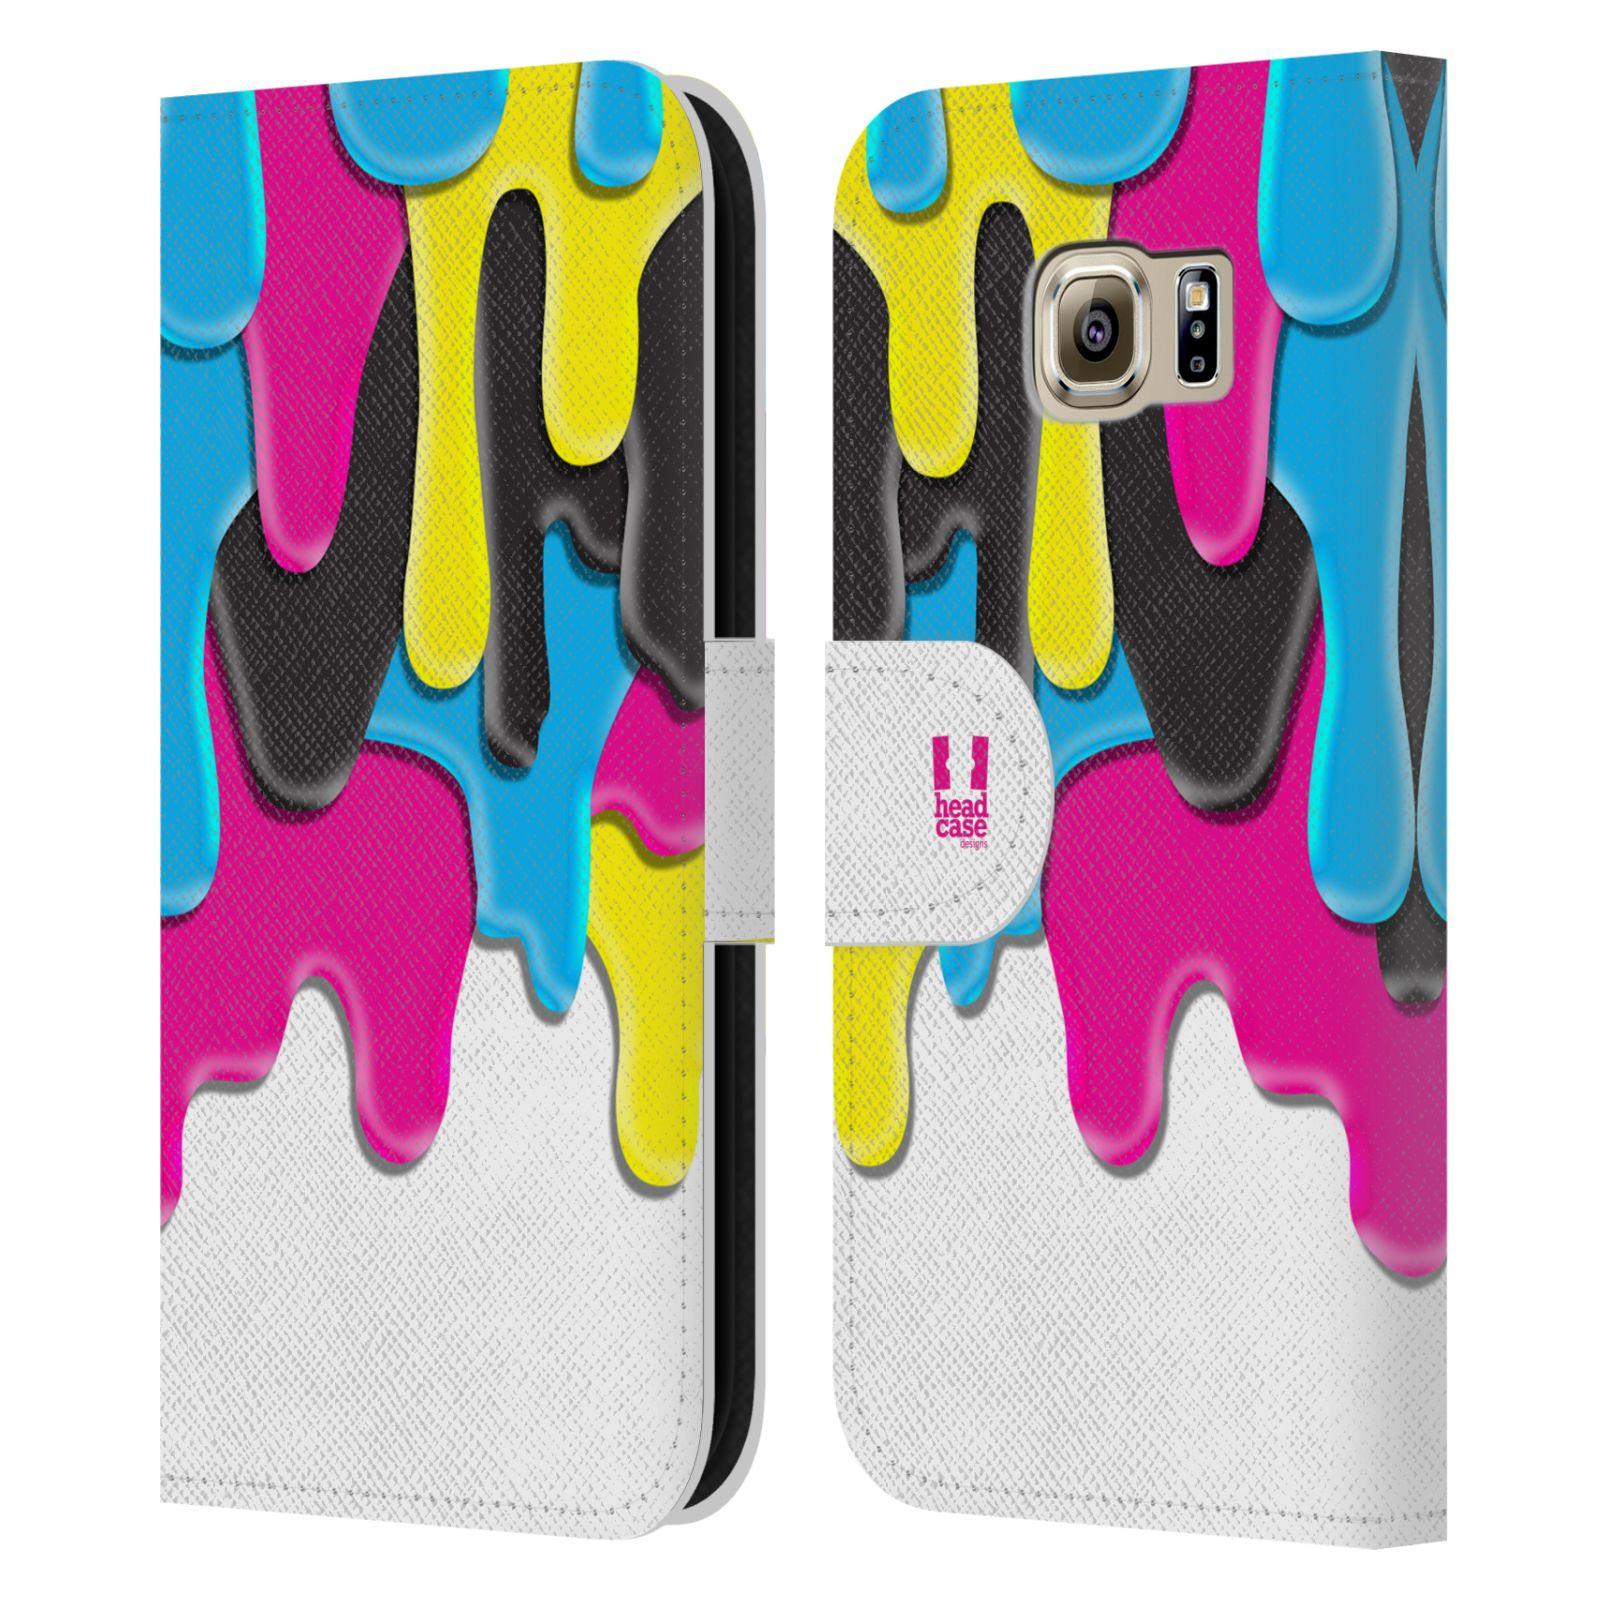 HEAD CASE Flipové pouzdro pro mobil Samsung Galaxy S6 (G9200) ZÁPLAVA BARVA MIX barev